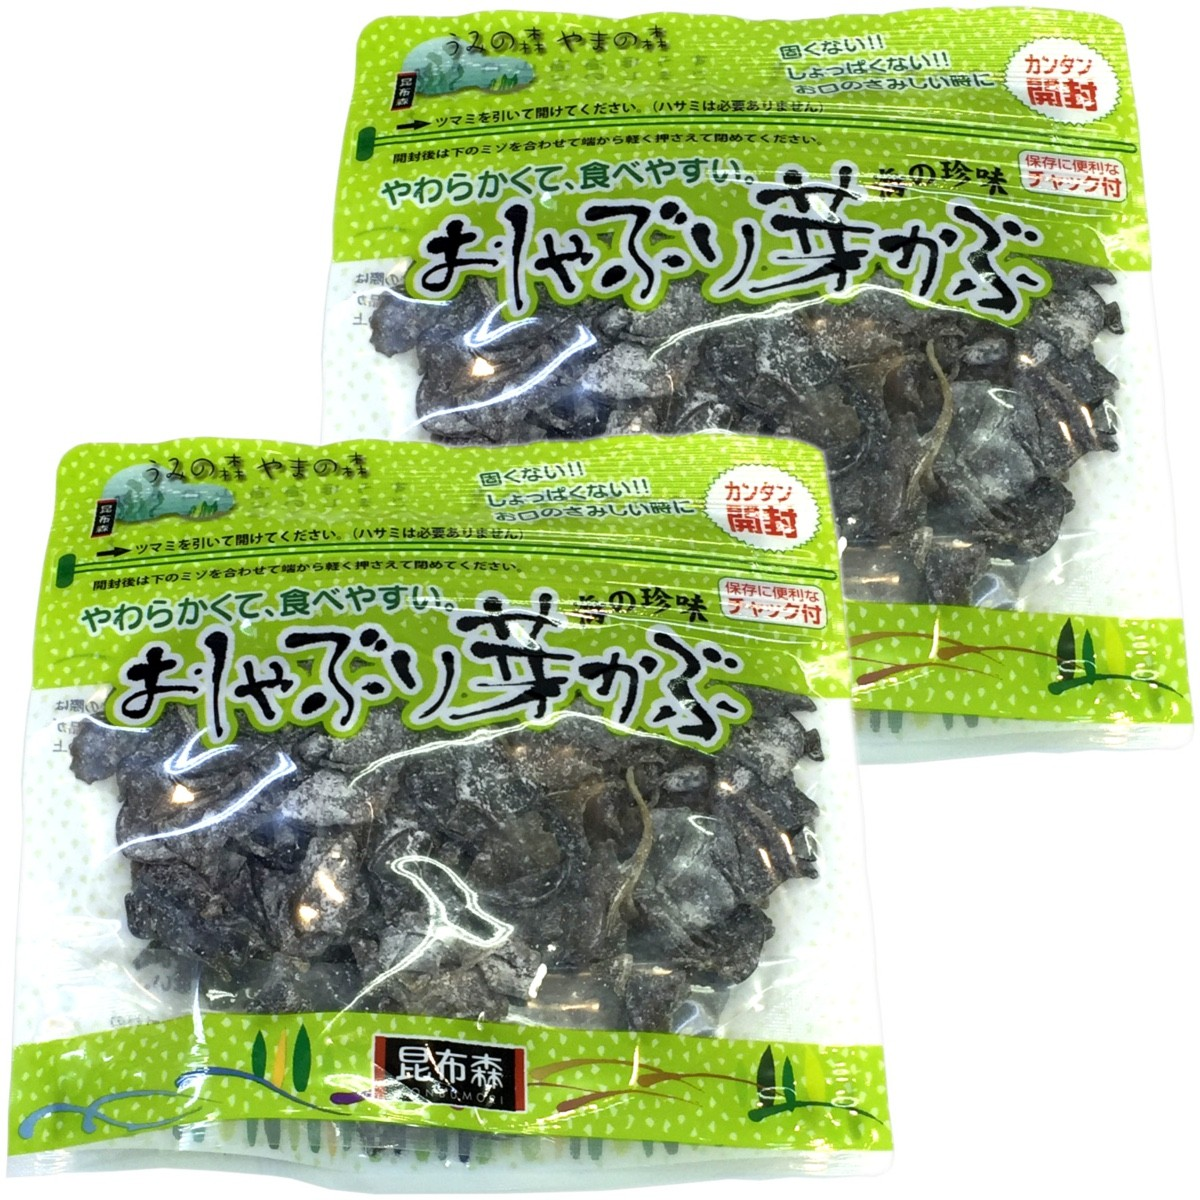 Oshaburi Mekabu Seaweed, 95g x 2 packs